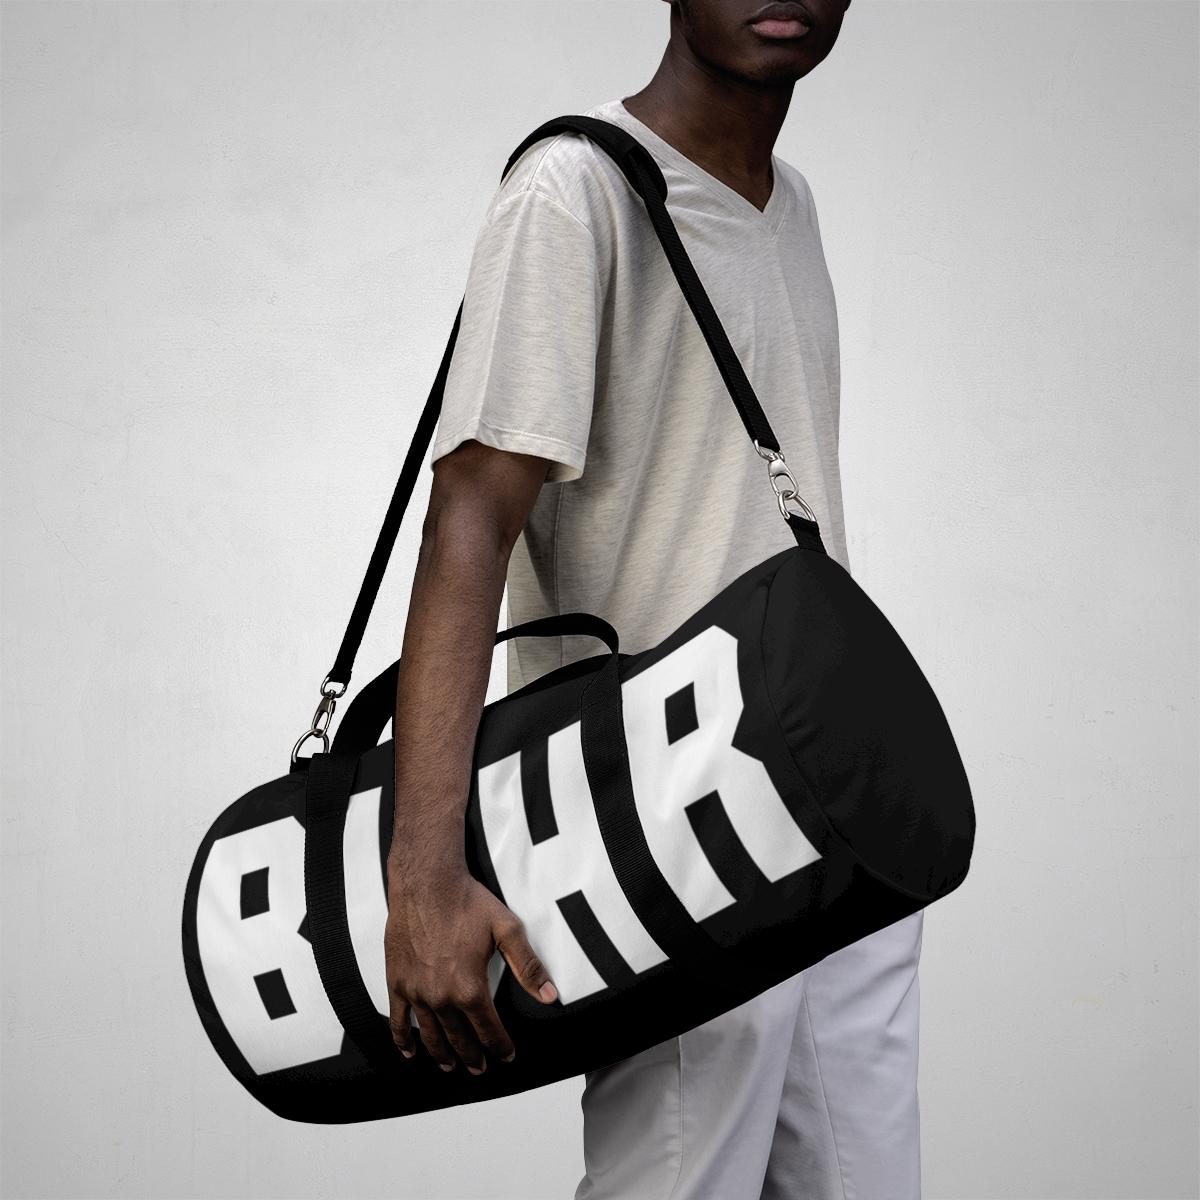 ELKE BUHR Duffel Bag (ELKE BUHR Prosome LE), 2020 /// 100% Oxford canvas /// Two sizes